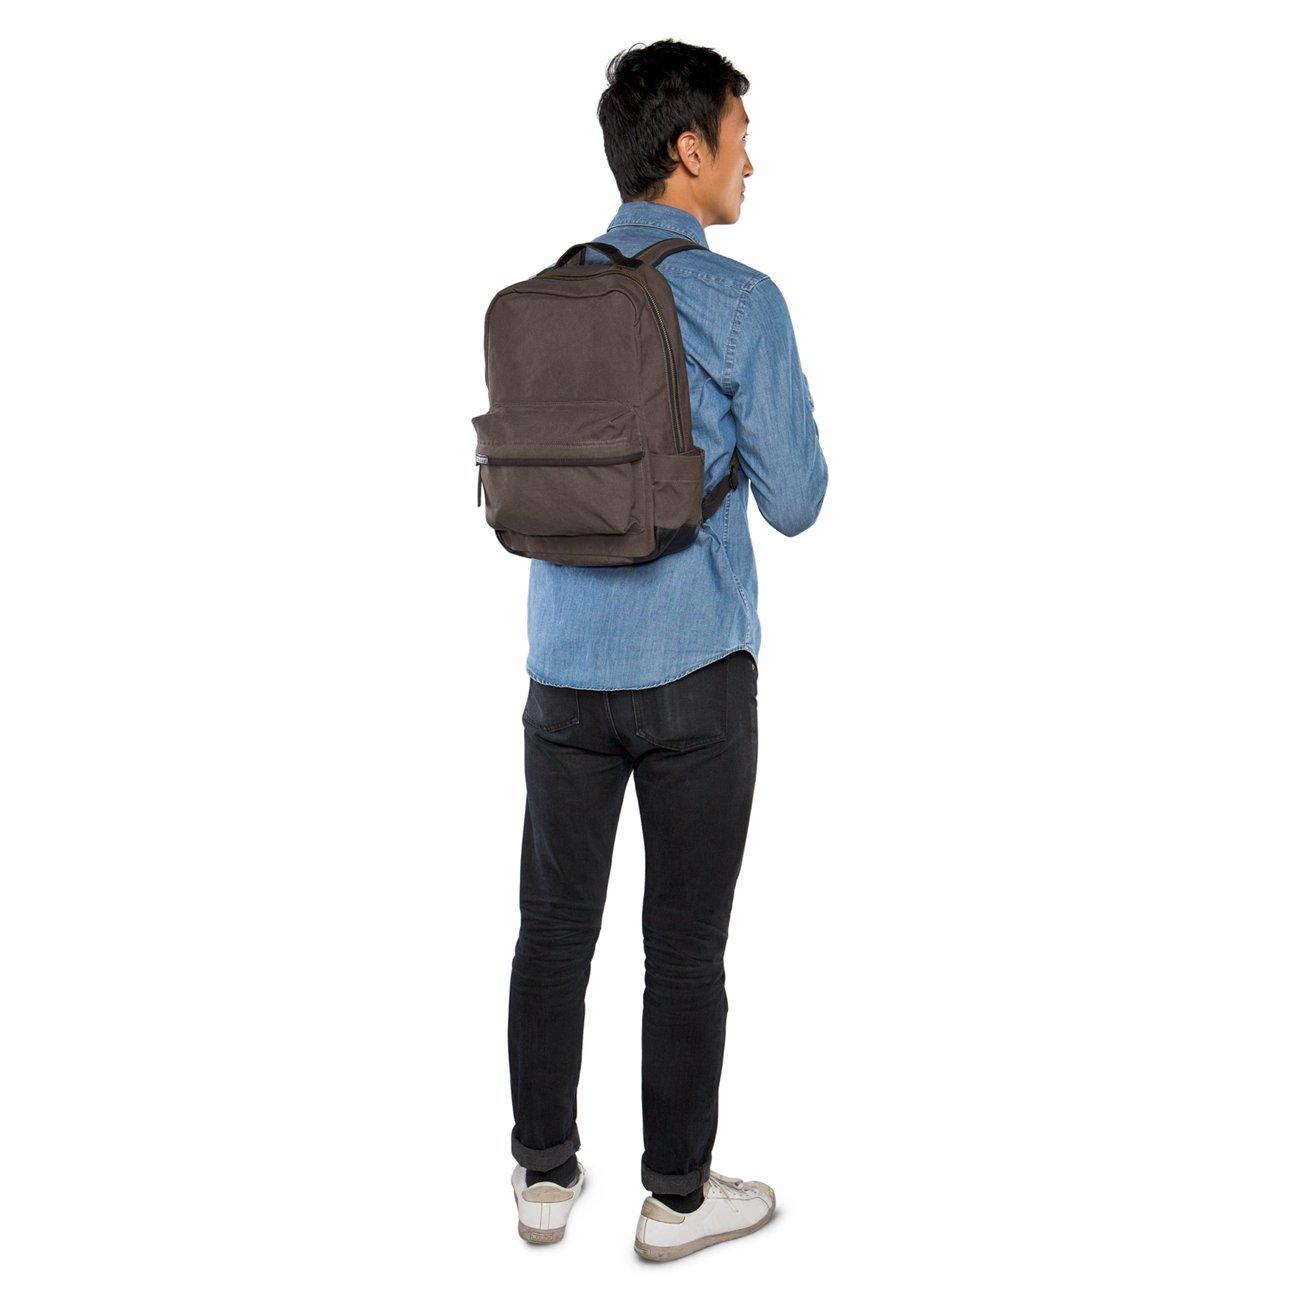 Timbuk2 Octavia Pack Sports Outdoors Q Backpack Hijau